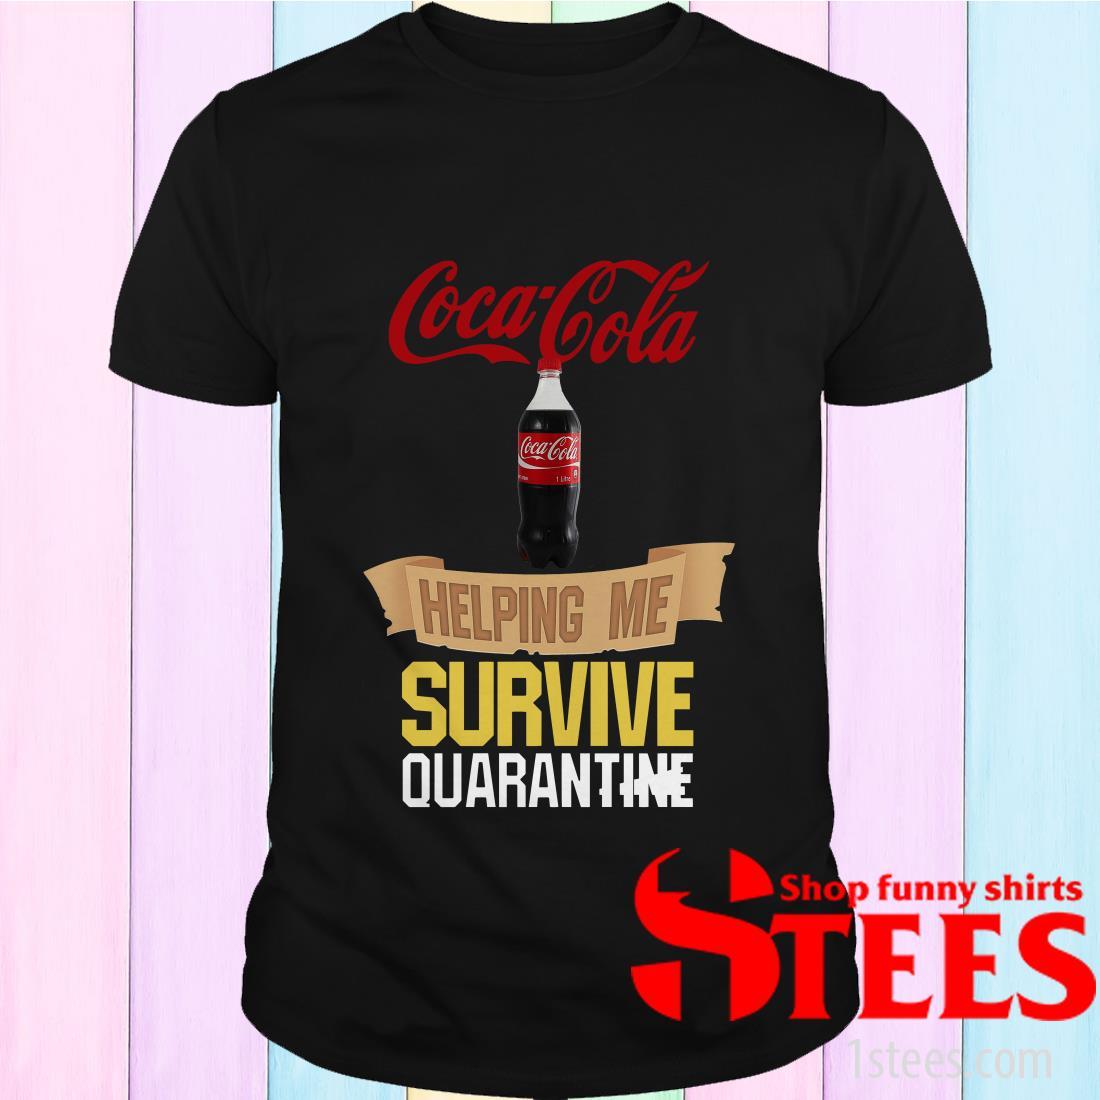 Coca Cola Helping Me Survive Quarantine Shirt